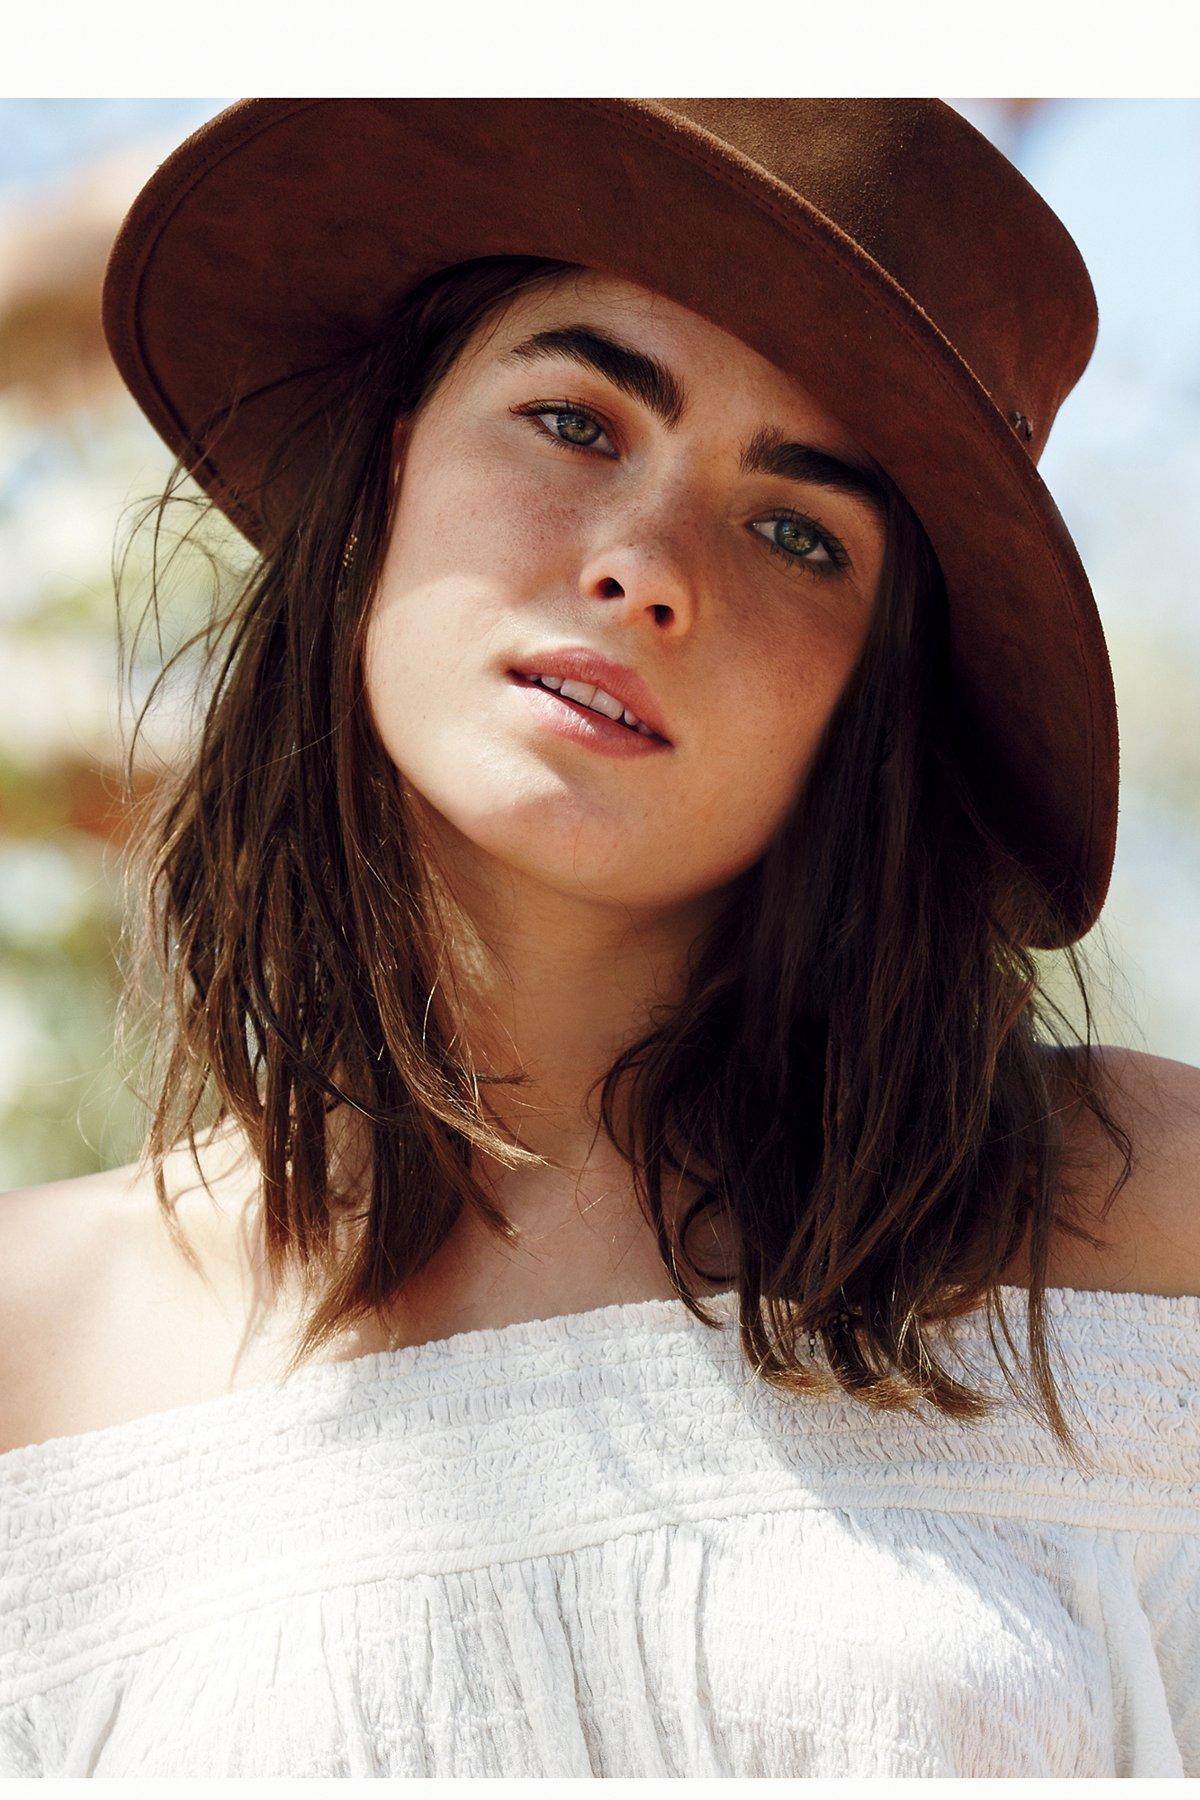 Lily西部帽